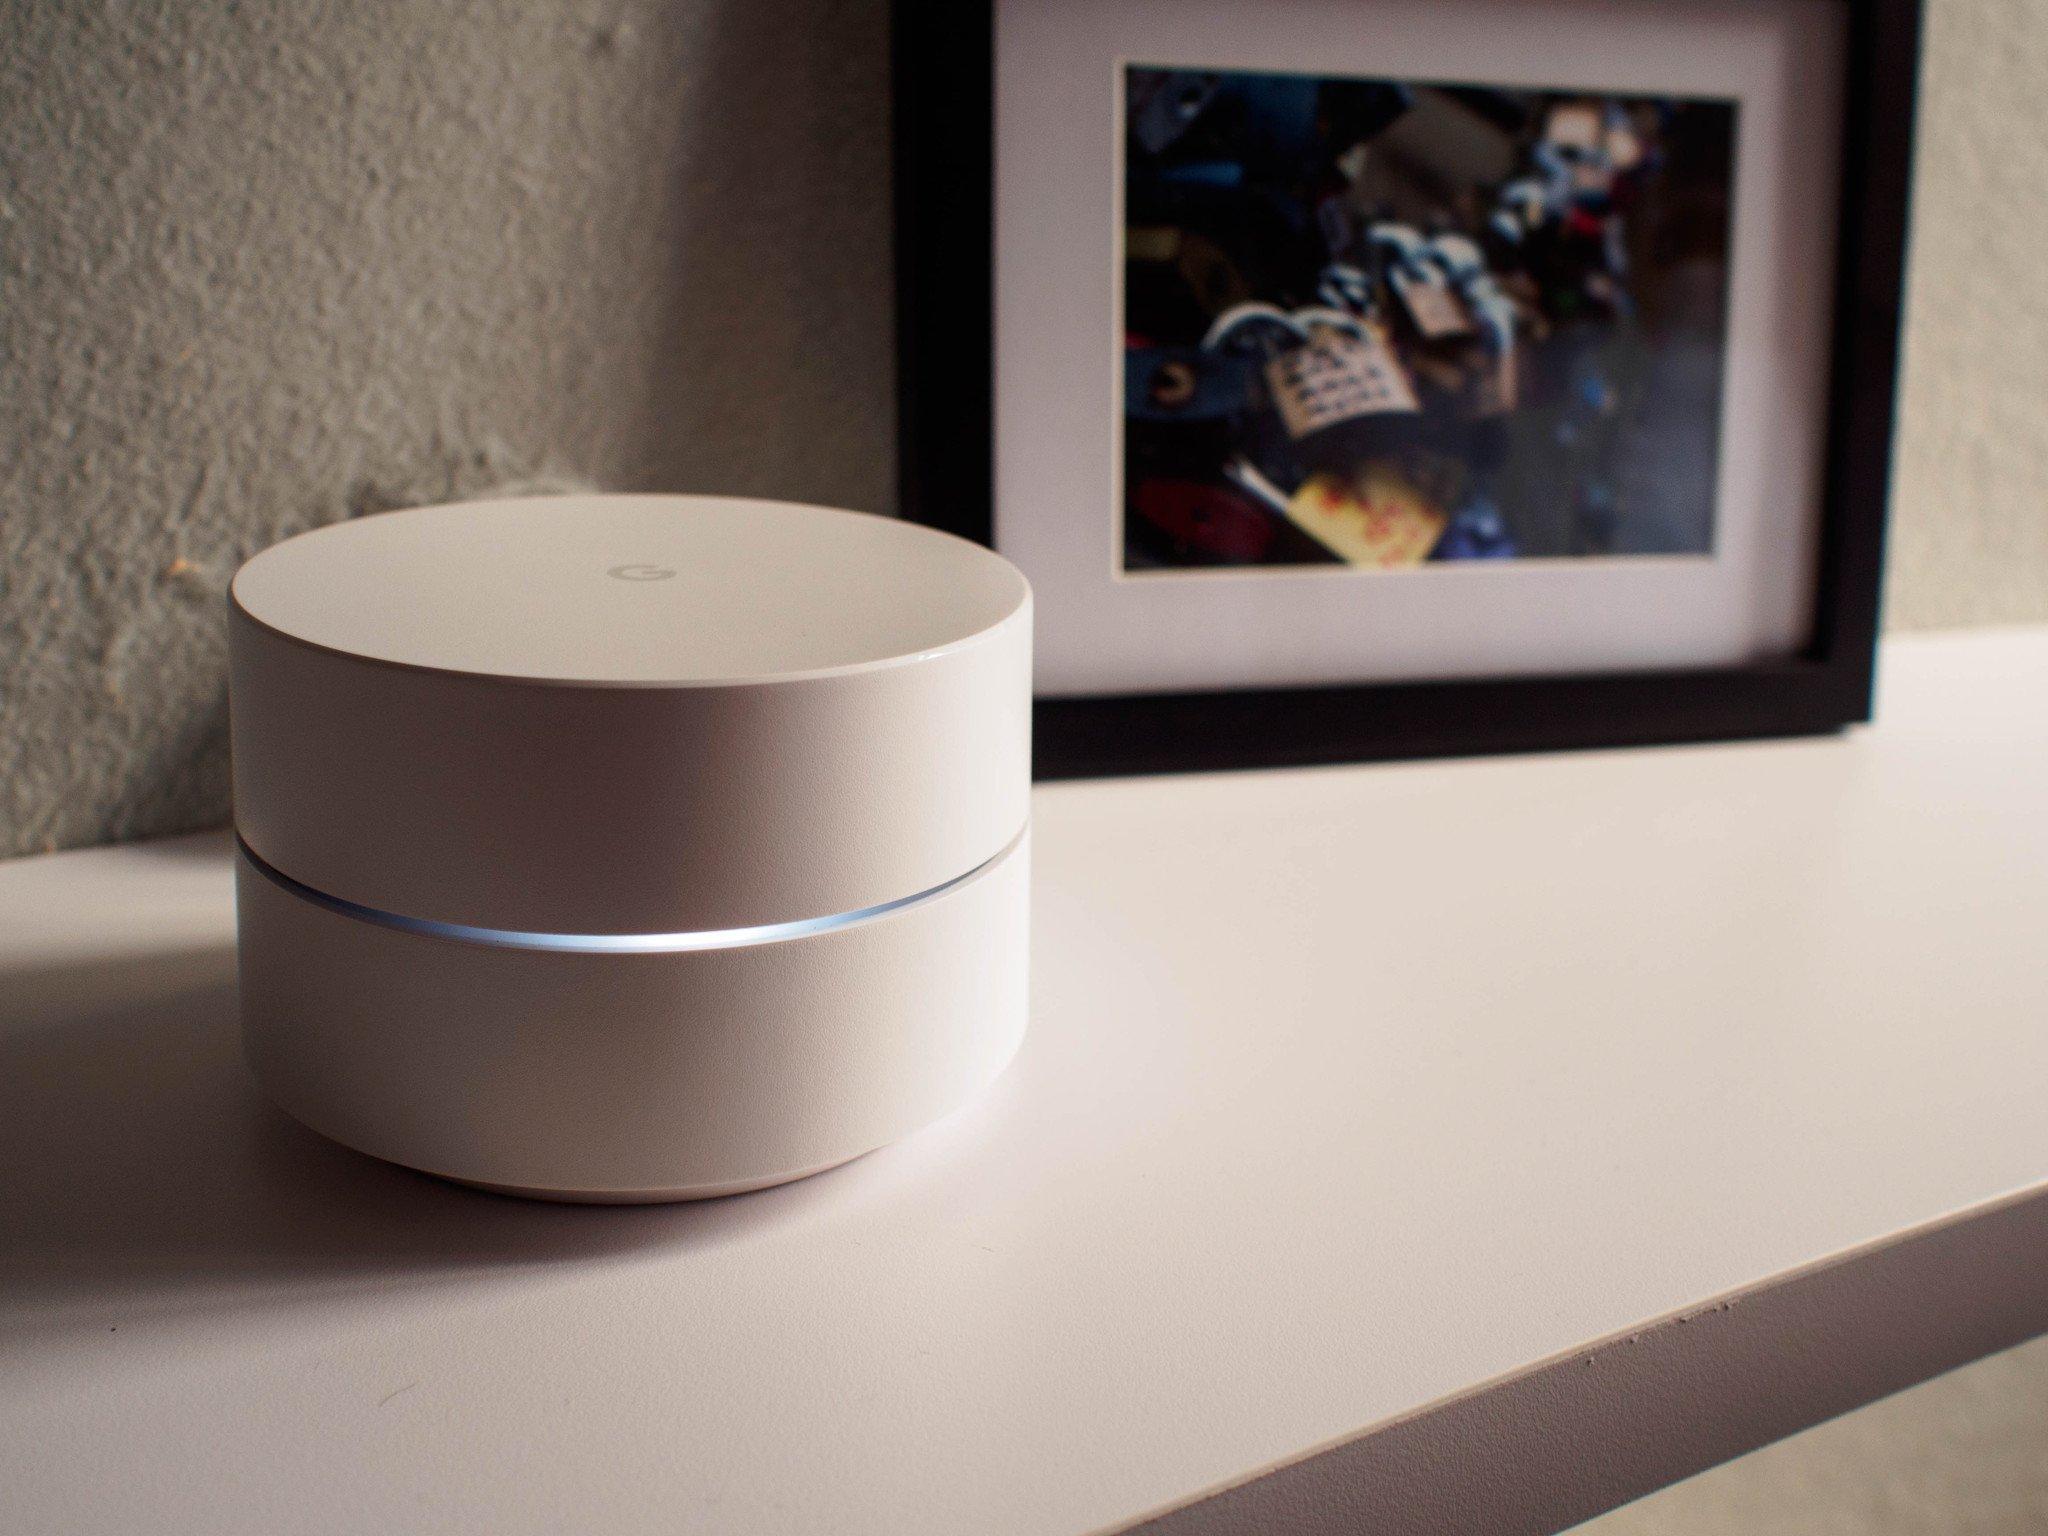 google wifi [ 1600 x 1200 Pixel ]